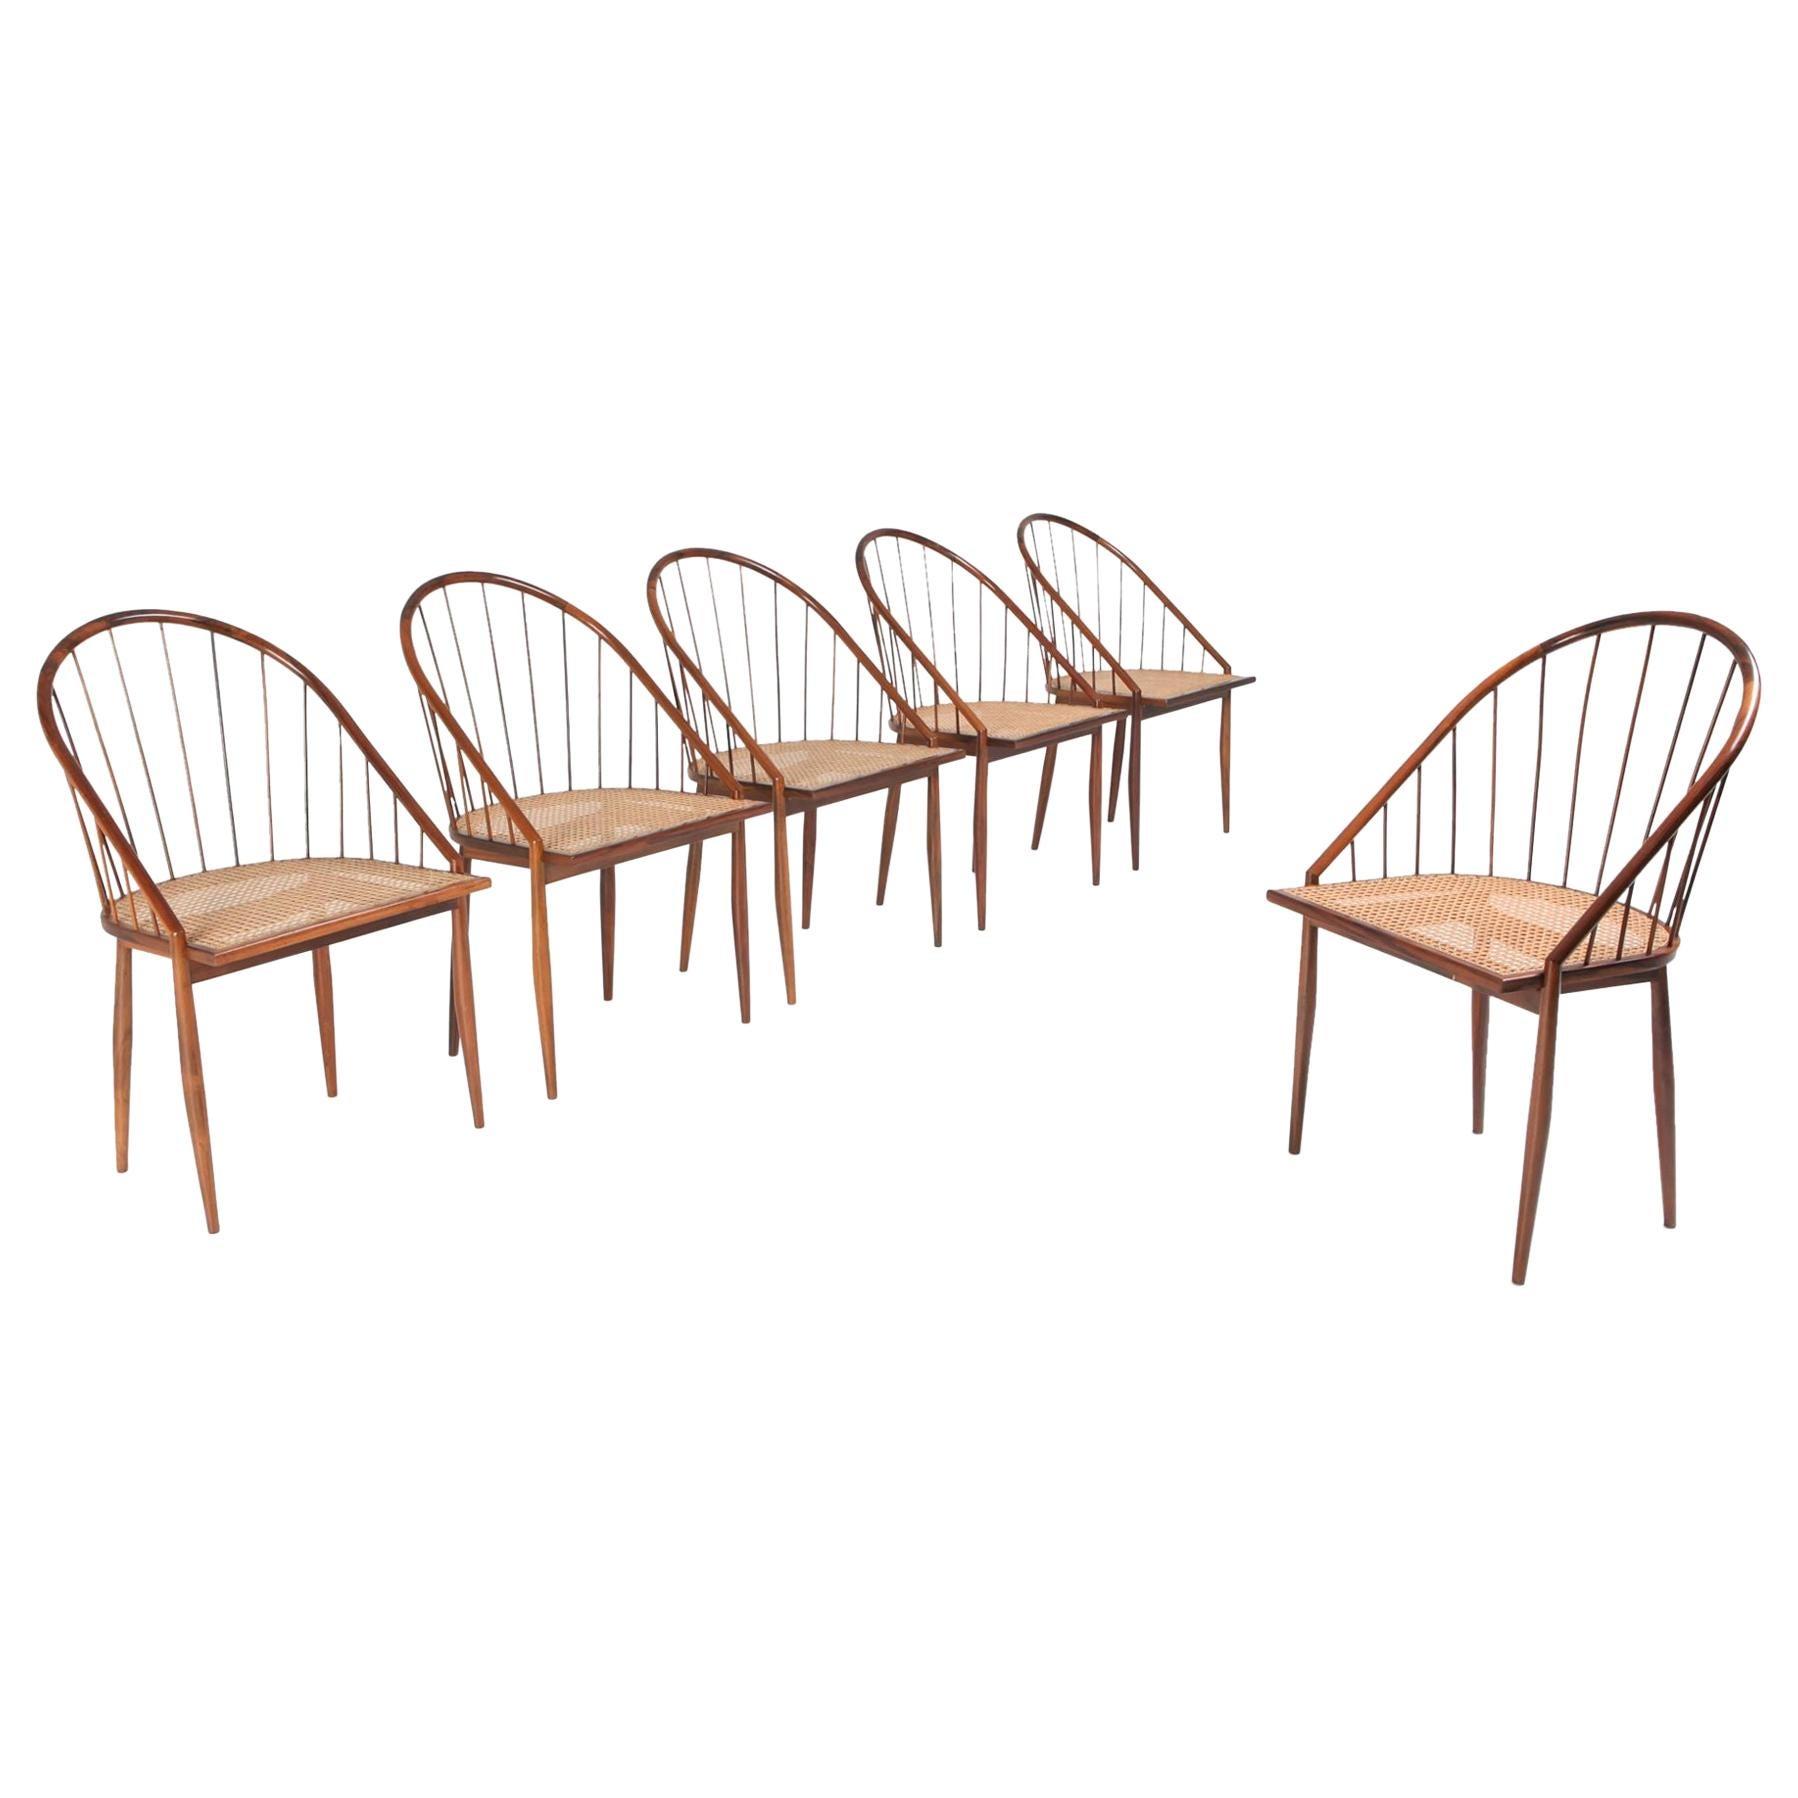 Set of 6 Curva Dining Chairs by Joaquim Tenreiro